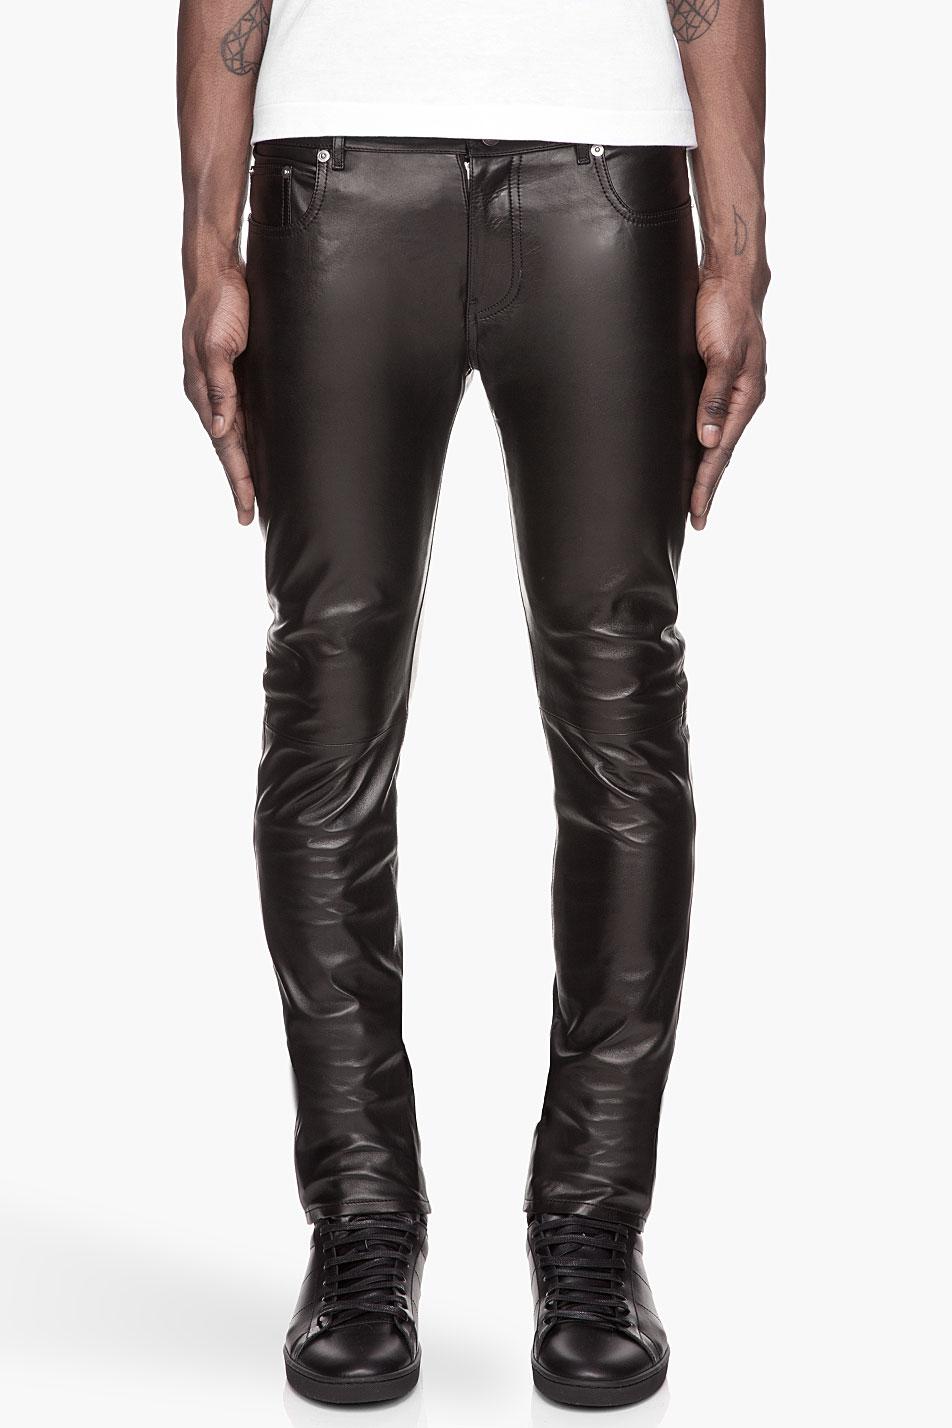 Pantalon En Daim Maigre - Vert Saint Laurent gOpq6dc